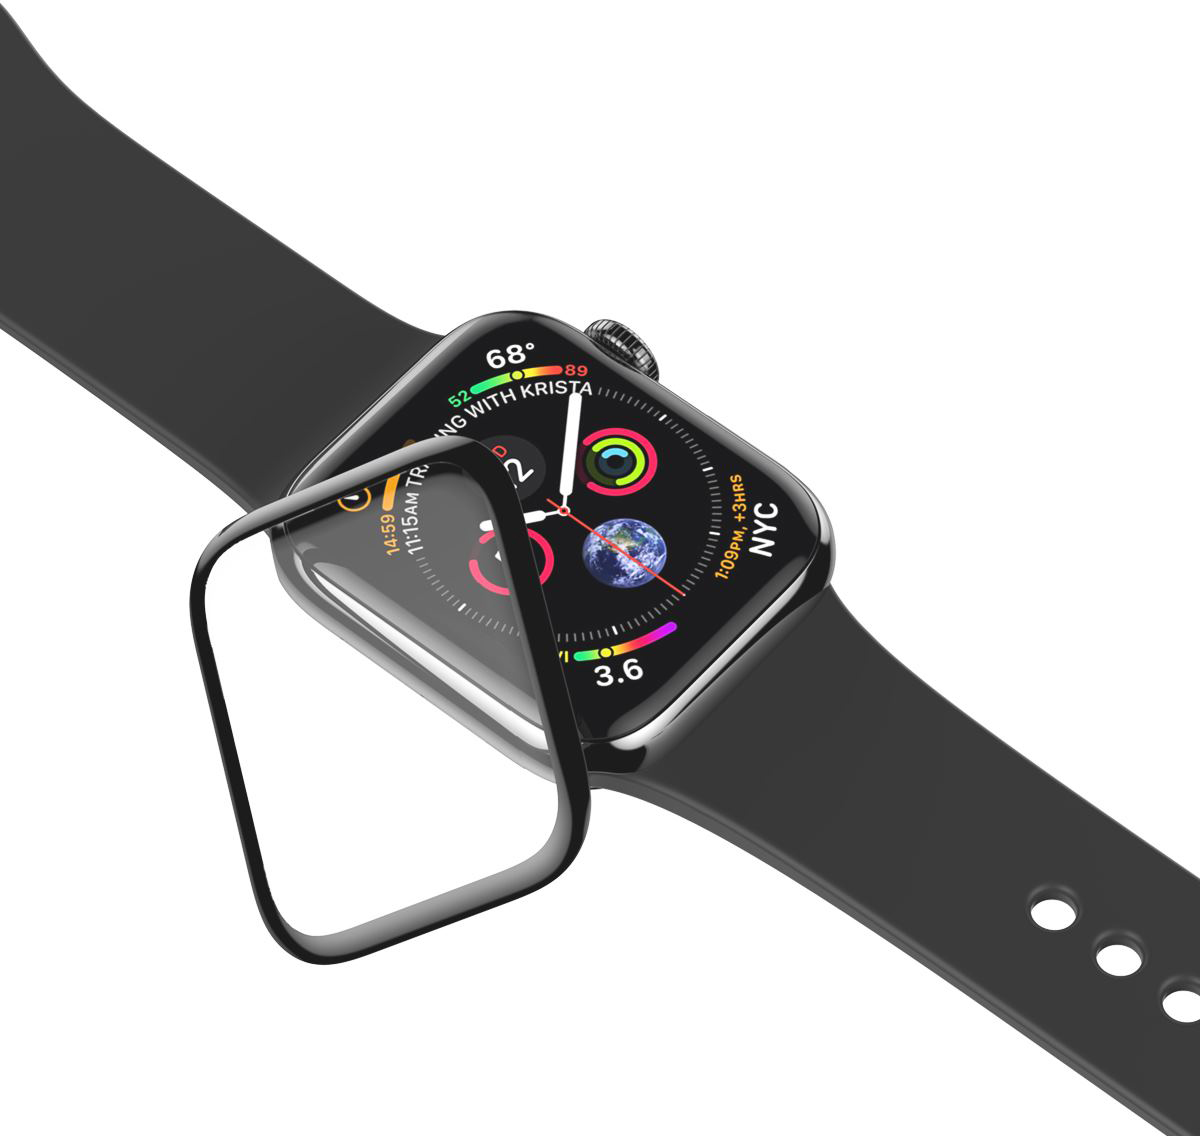 Защитное стекло uBear 3D (GL29BL42-AW3) для Apple Watch Series 3 42mm (Black)